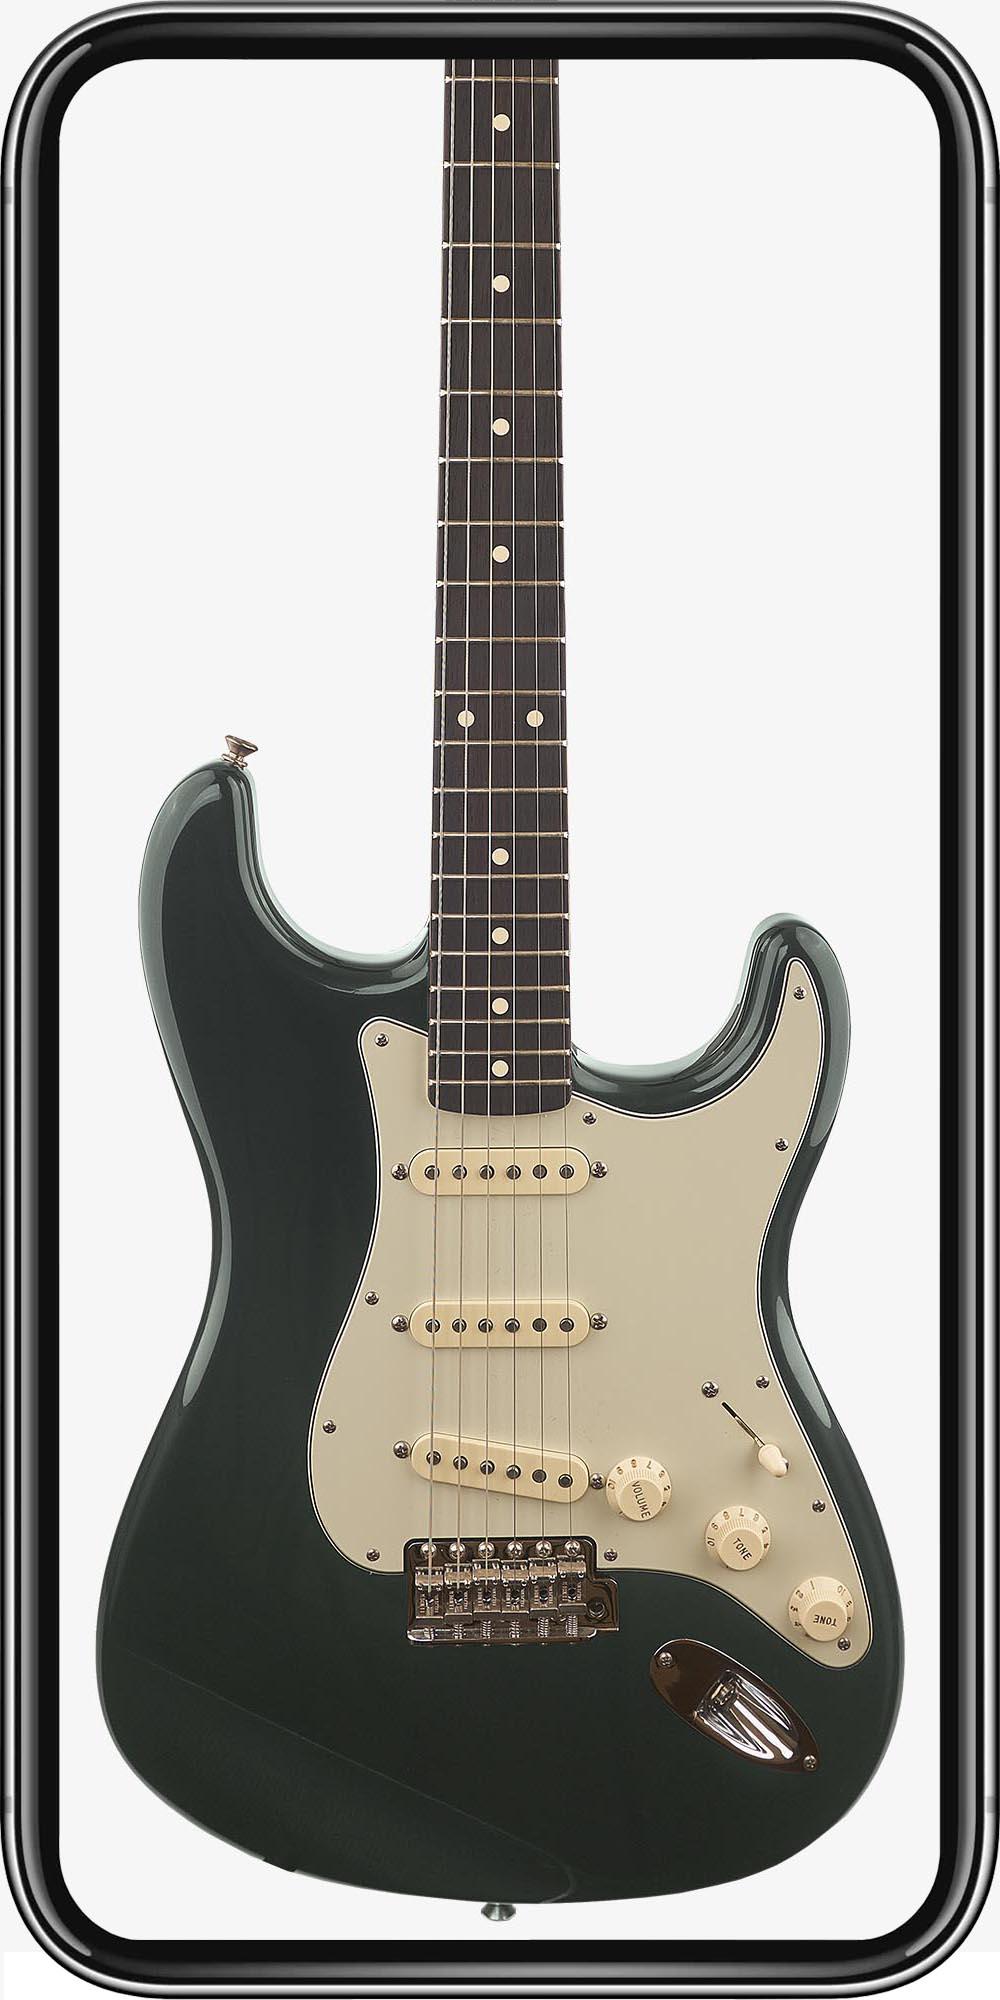 Fender Custom Shop Stratocaster 60s NOS RW Dark British Racing Green